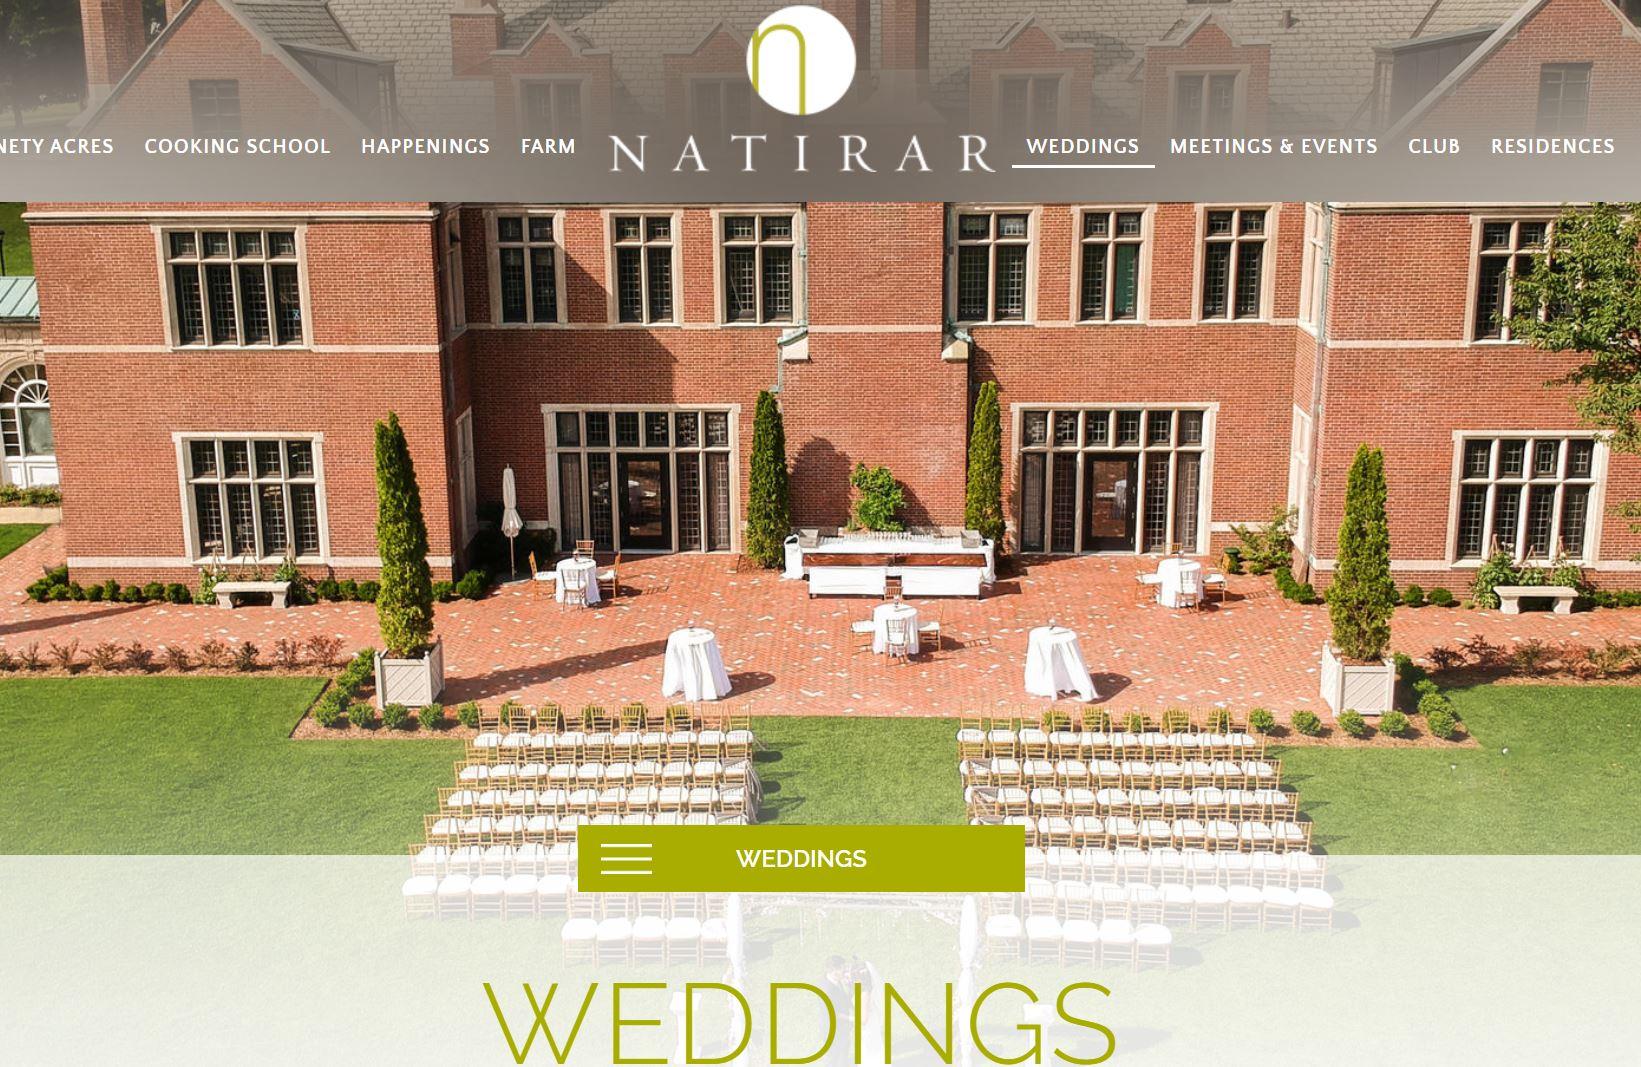 Historic Wedding Venues - Mr Local History